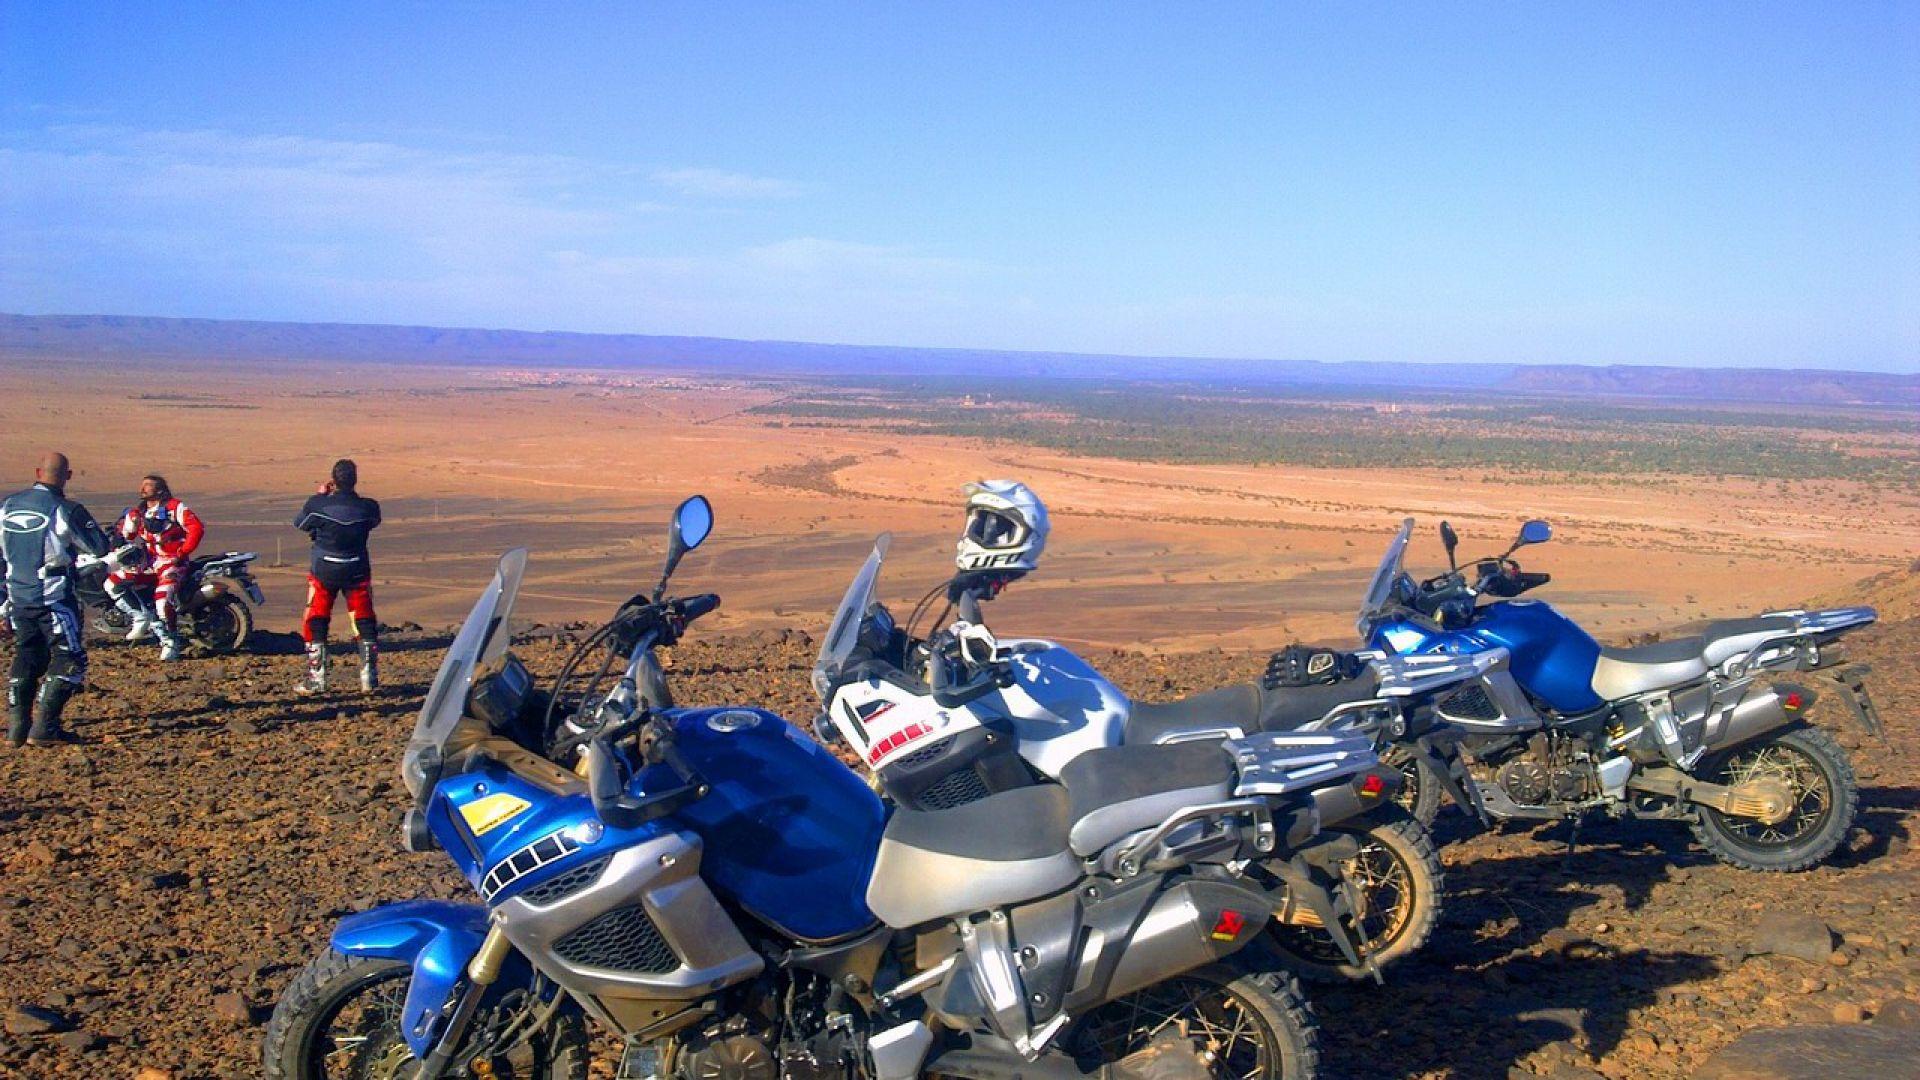 Immagine 116: In Marocco con la Yamaha Super Ténéré